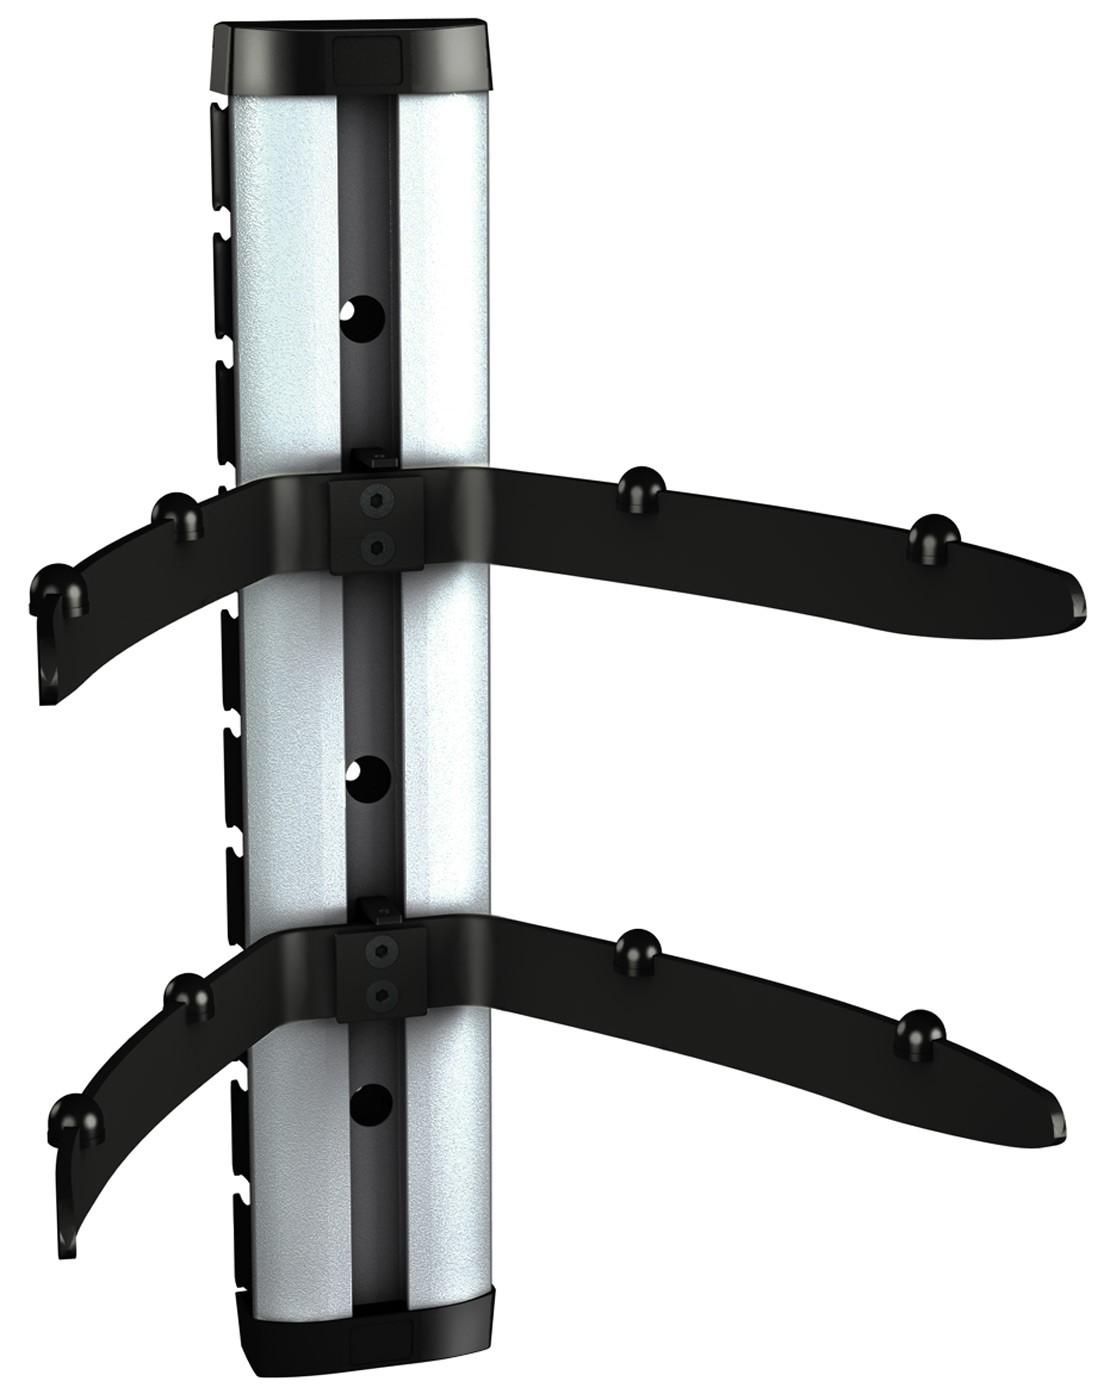 hifi regal dvd wandhalterung glas wandboard glasregal xl 11178. Black Bedroom Furniture Sets. Home Design Ideas